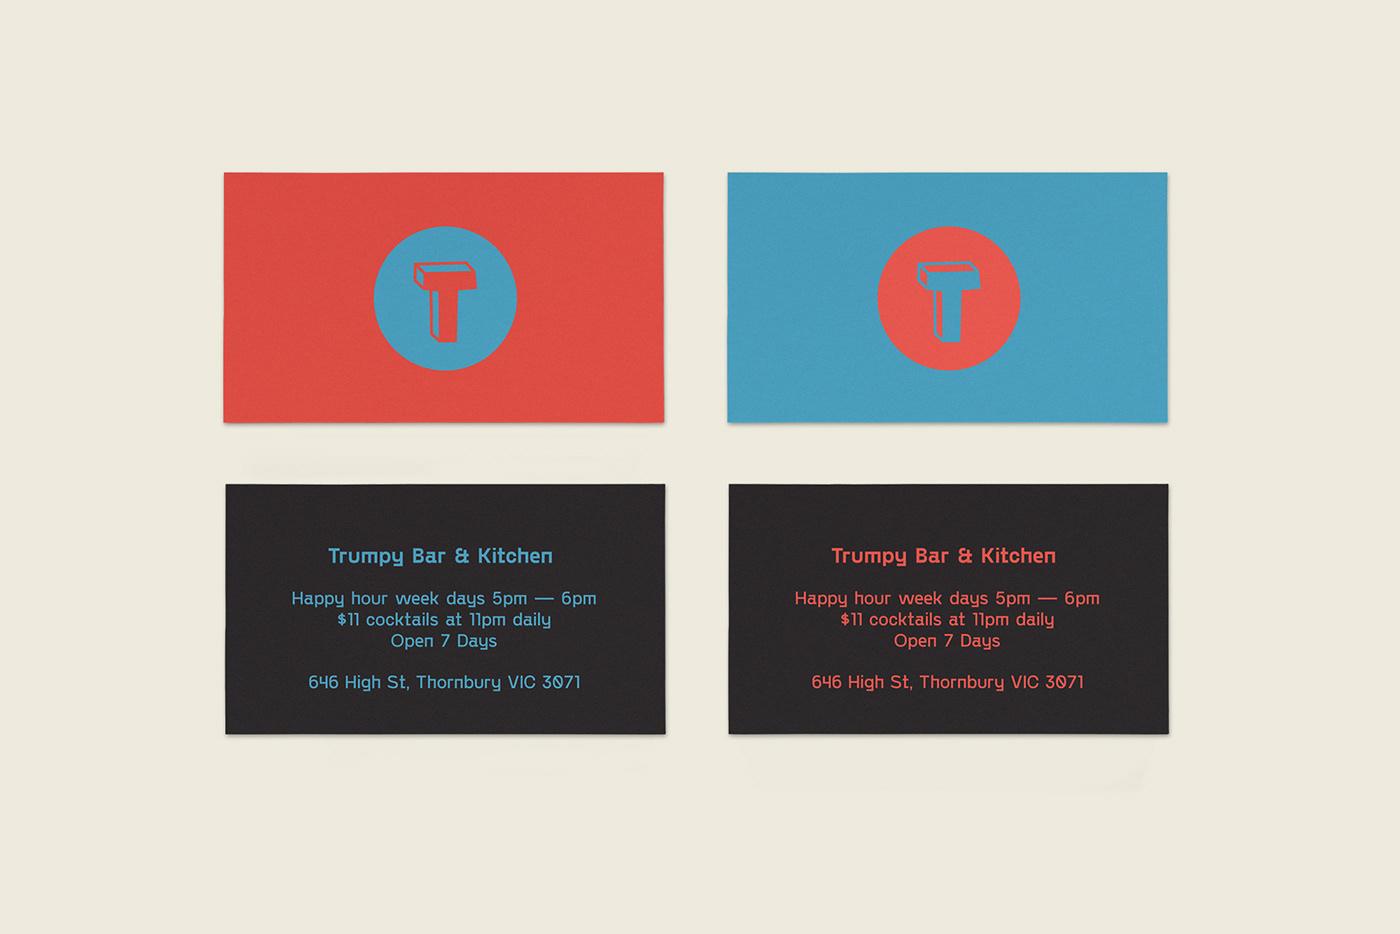 art direction  brand identity branding  concept creative graphic design  Hospitality